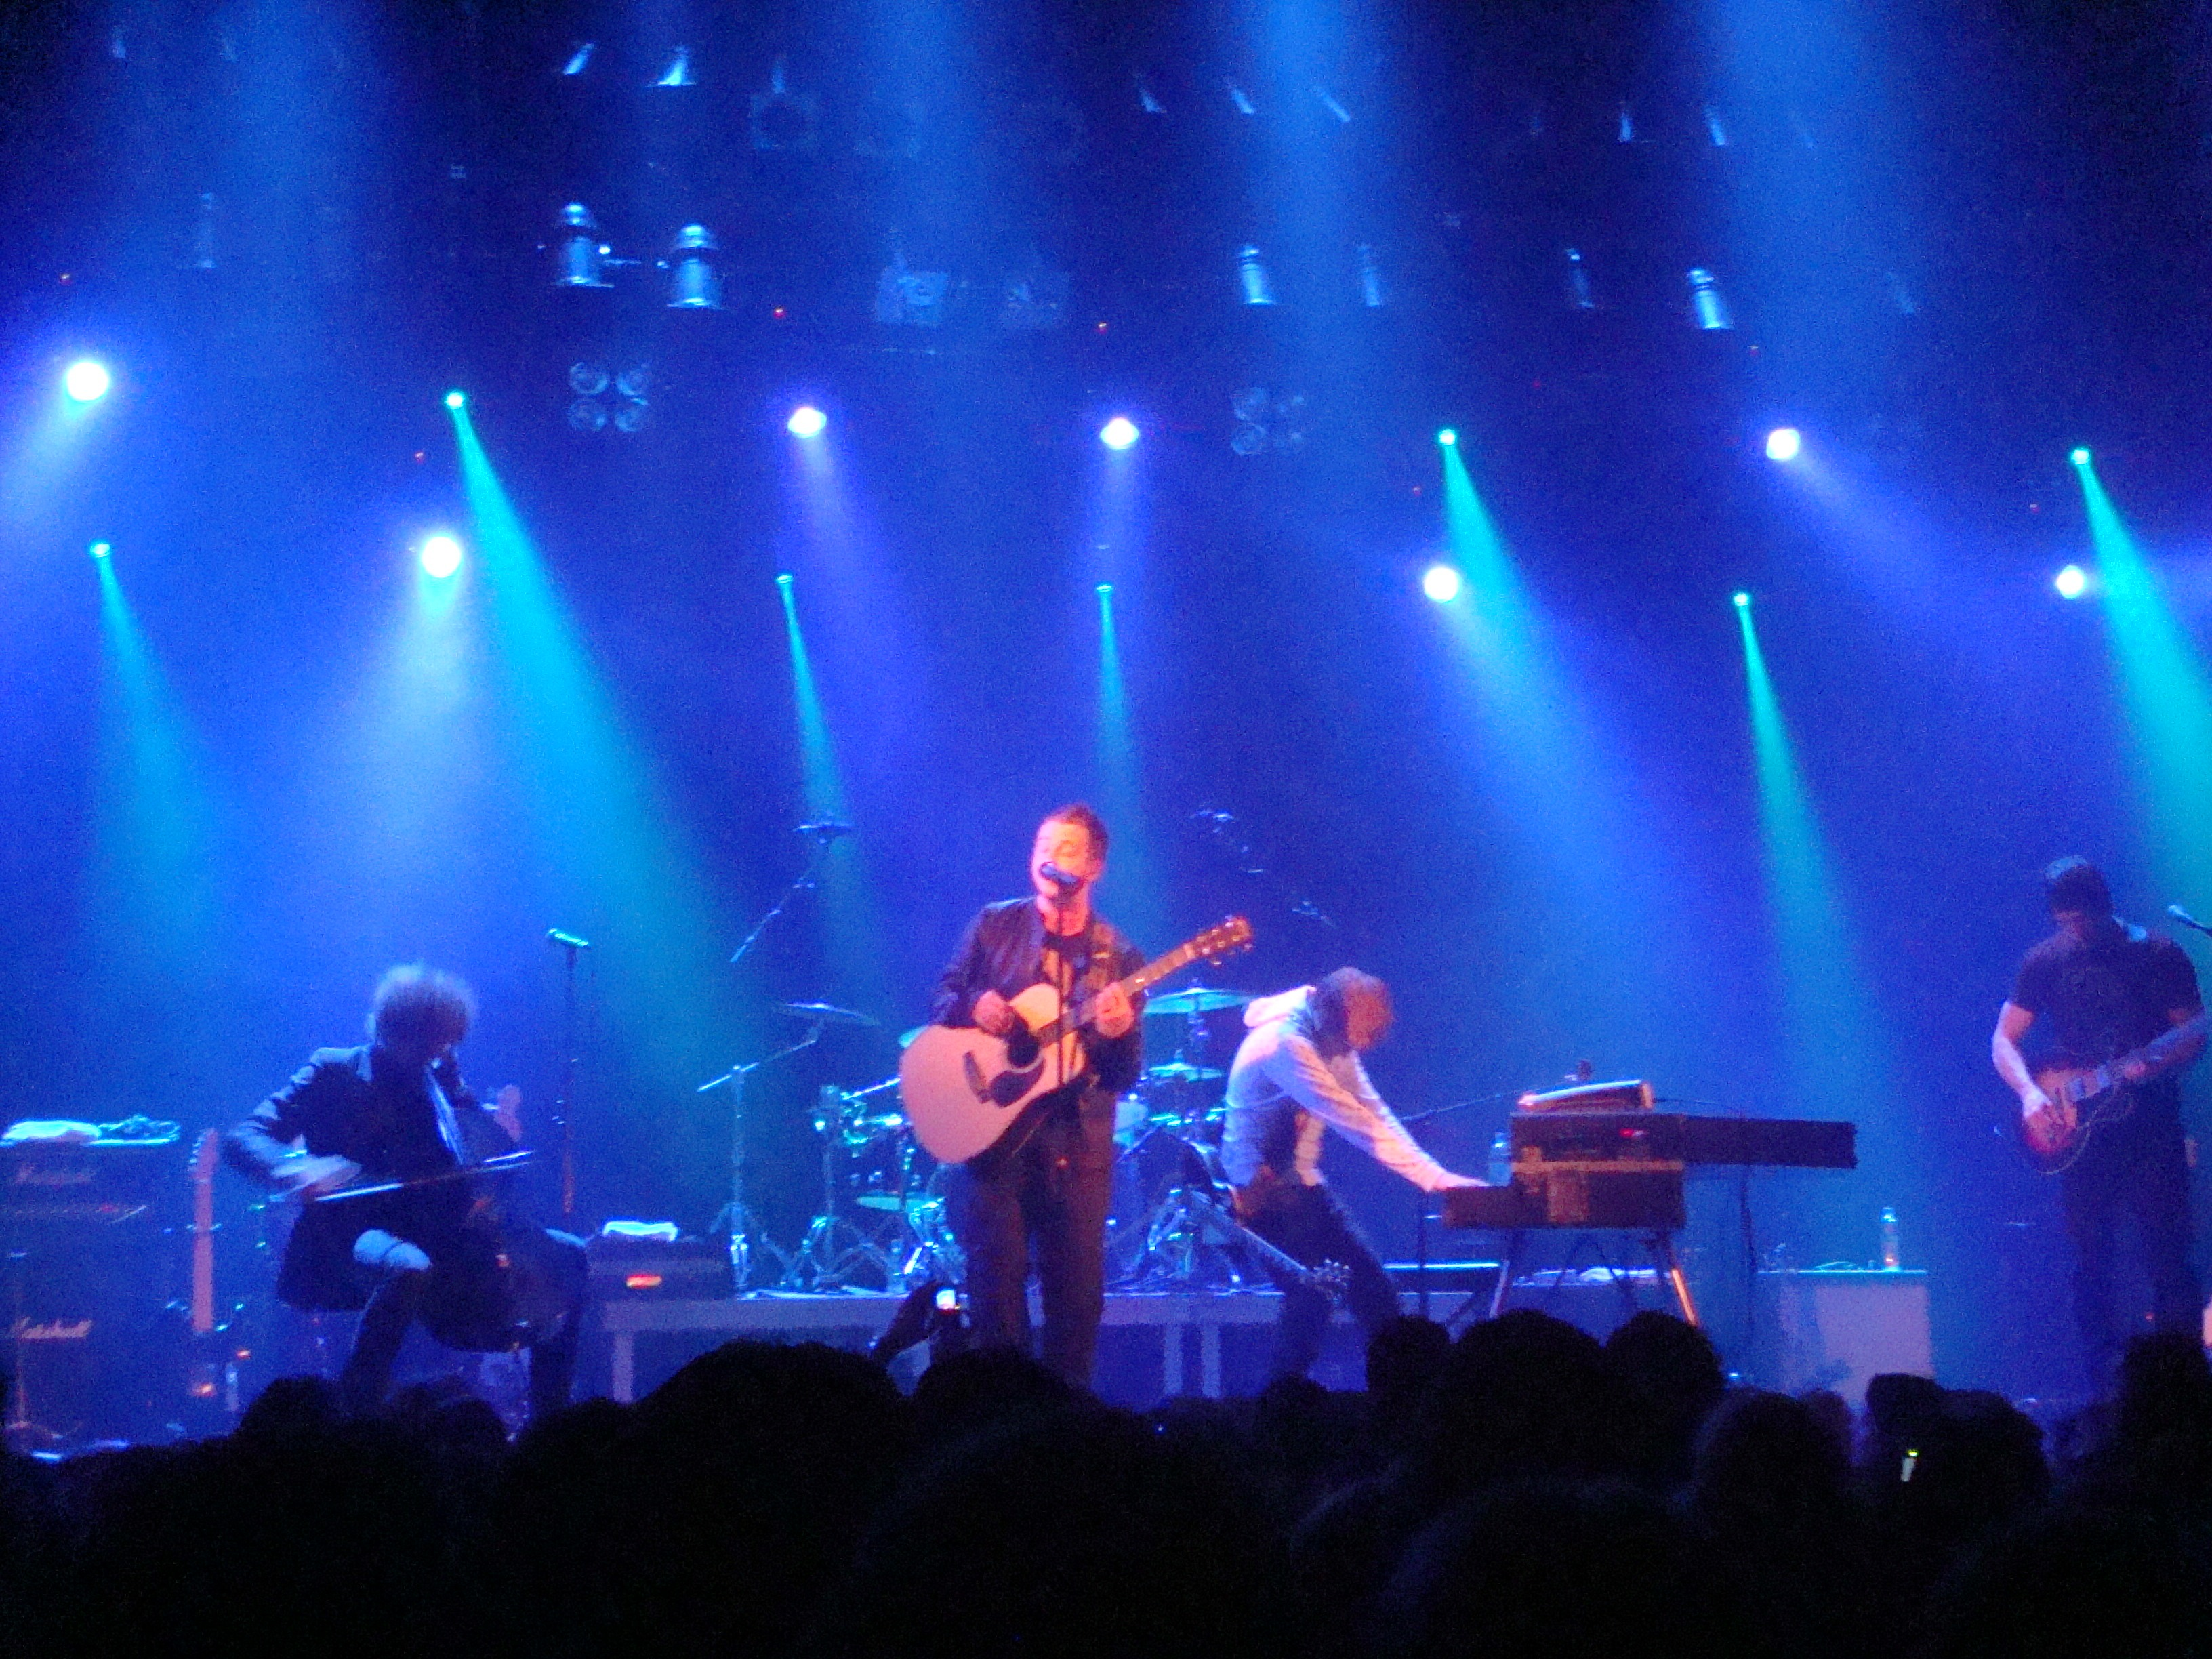 Cheap Tickets Concert >> OneRepublic Tempe Tickets - 2017 OneRepublic Tickets Tempe, AZ in Arizona